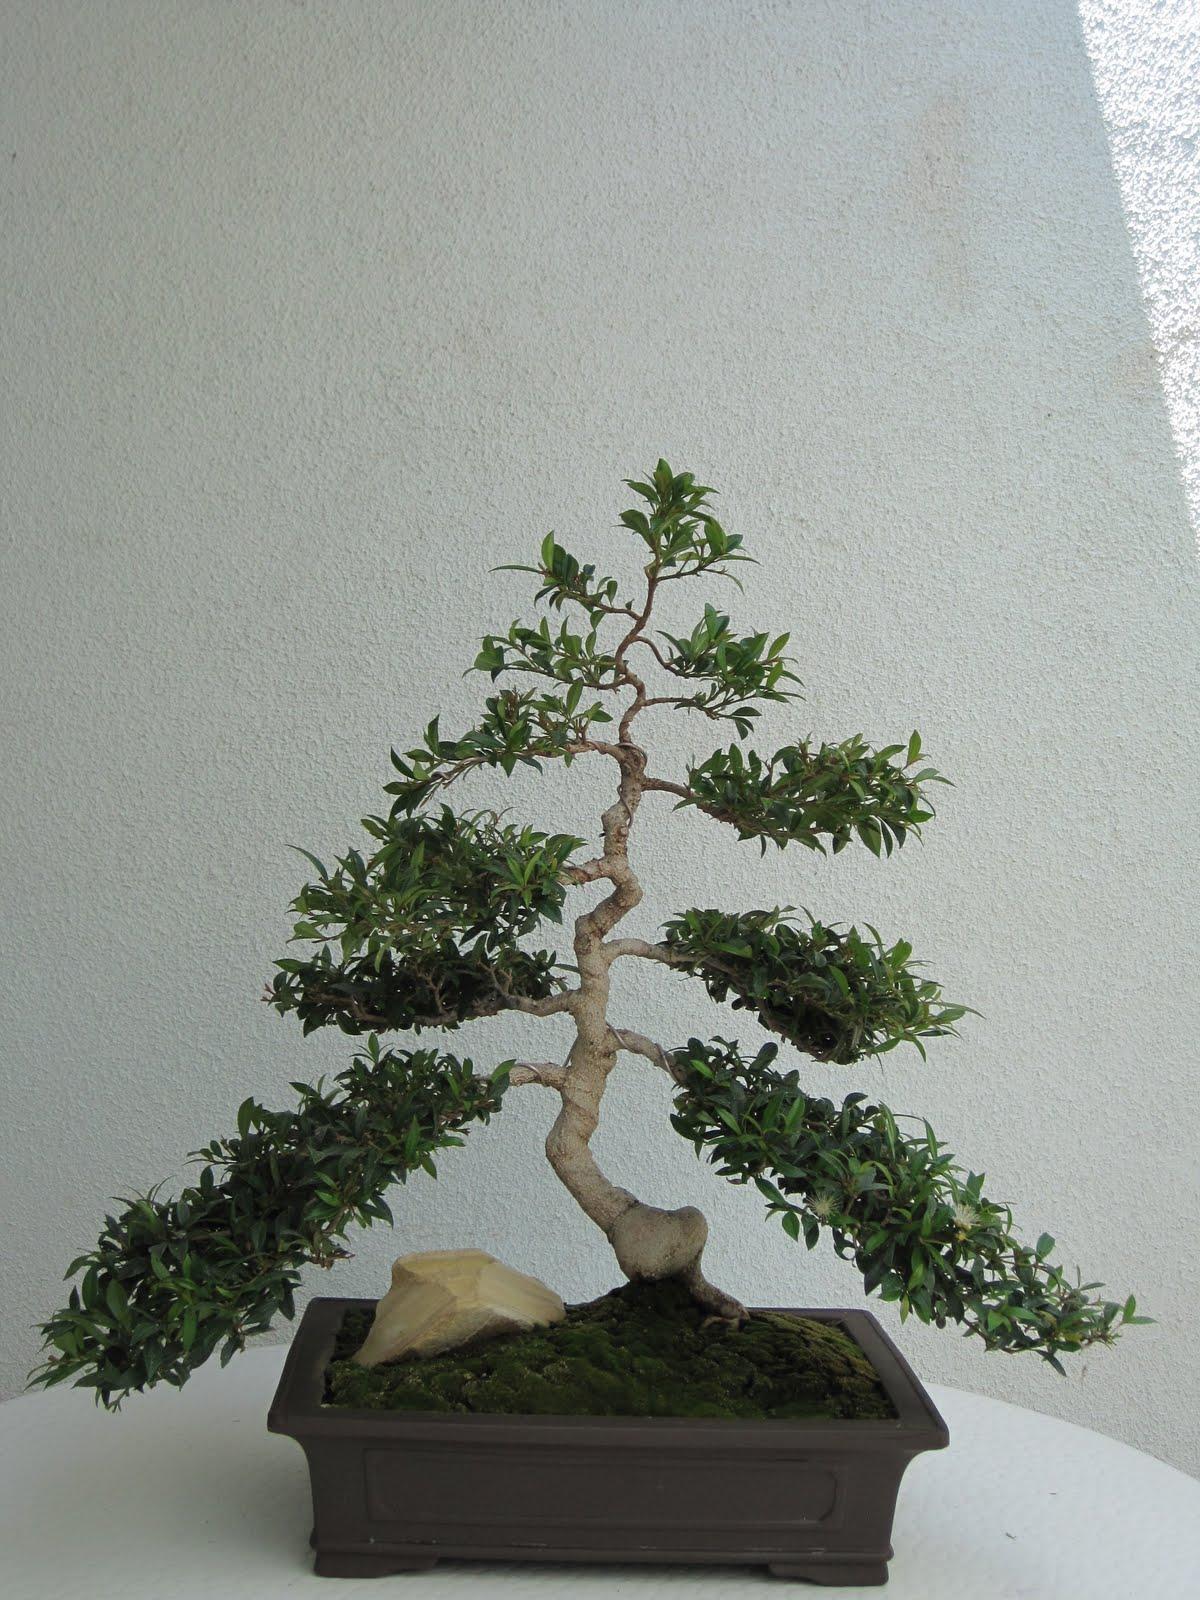 ShoChiku Bai Bonsai Club Bonsai Trees For Sale